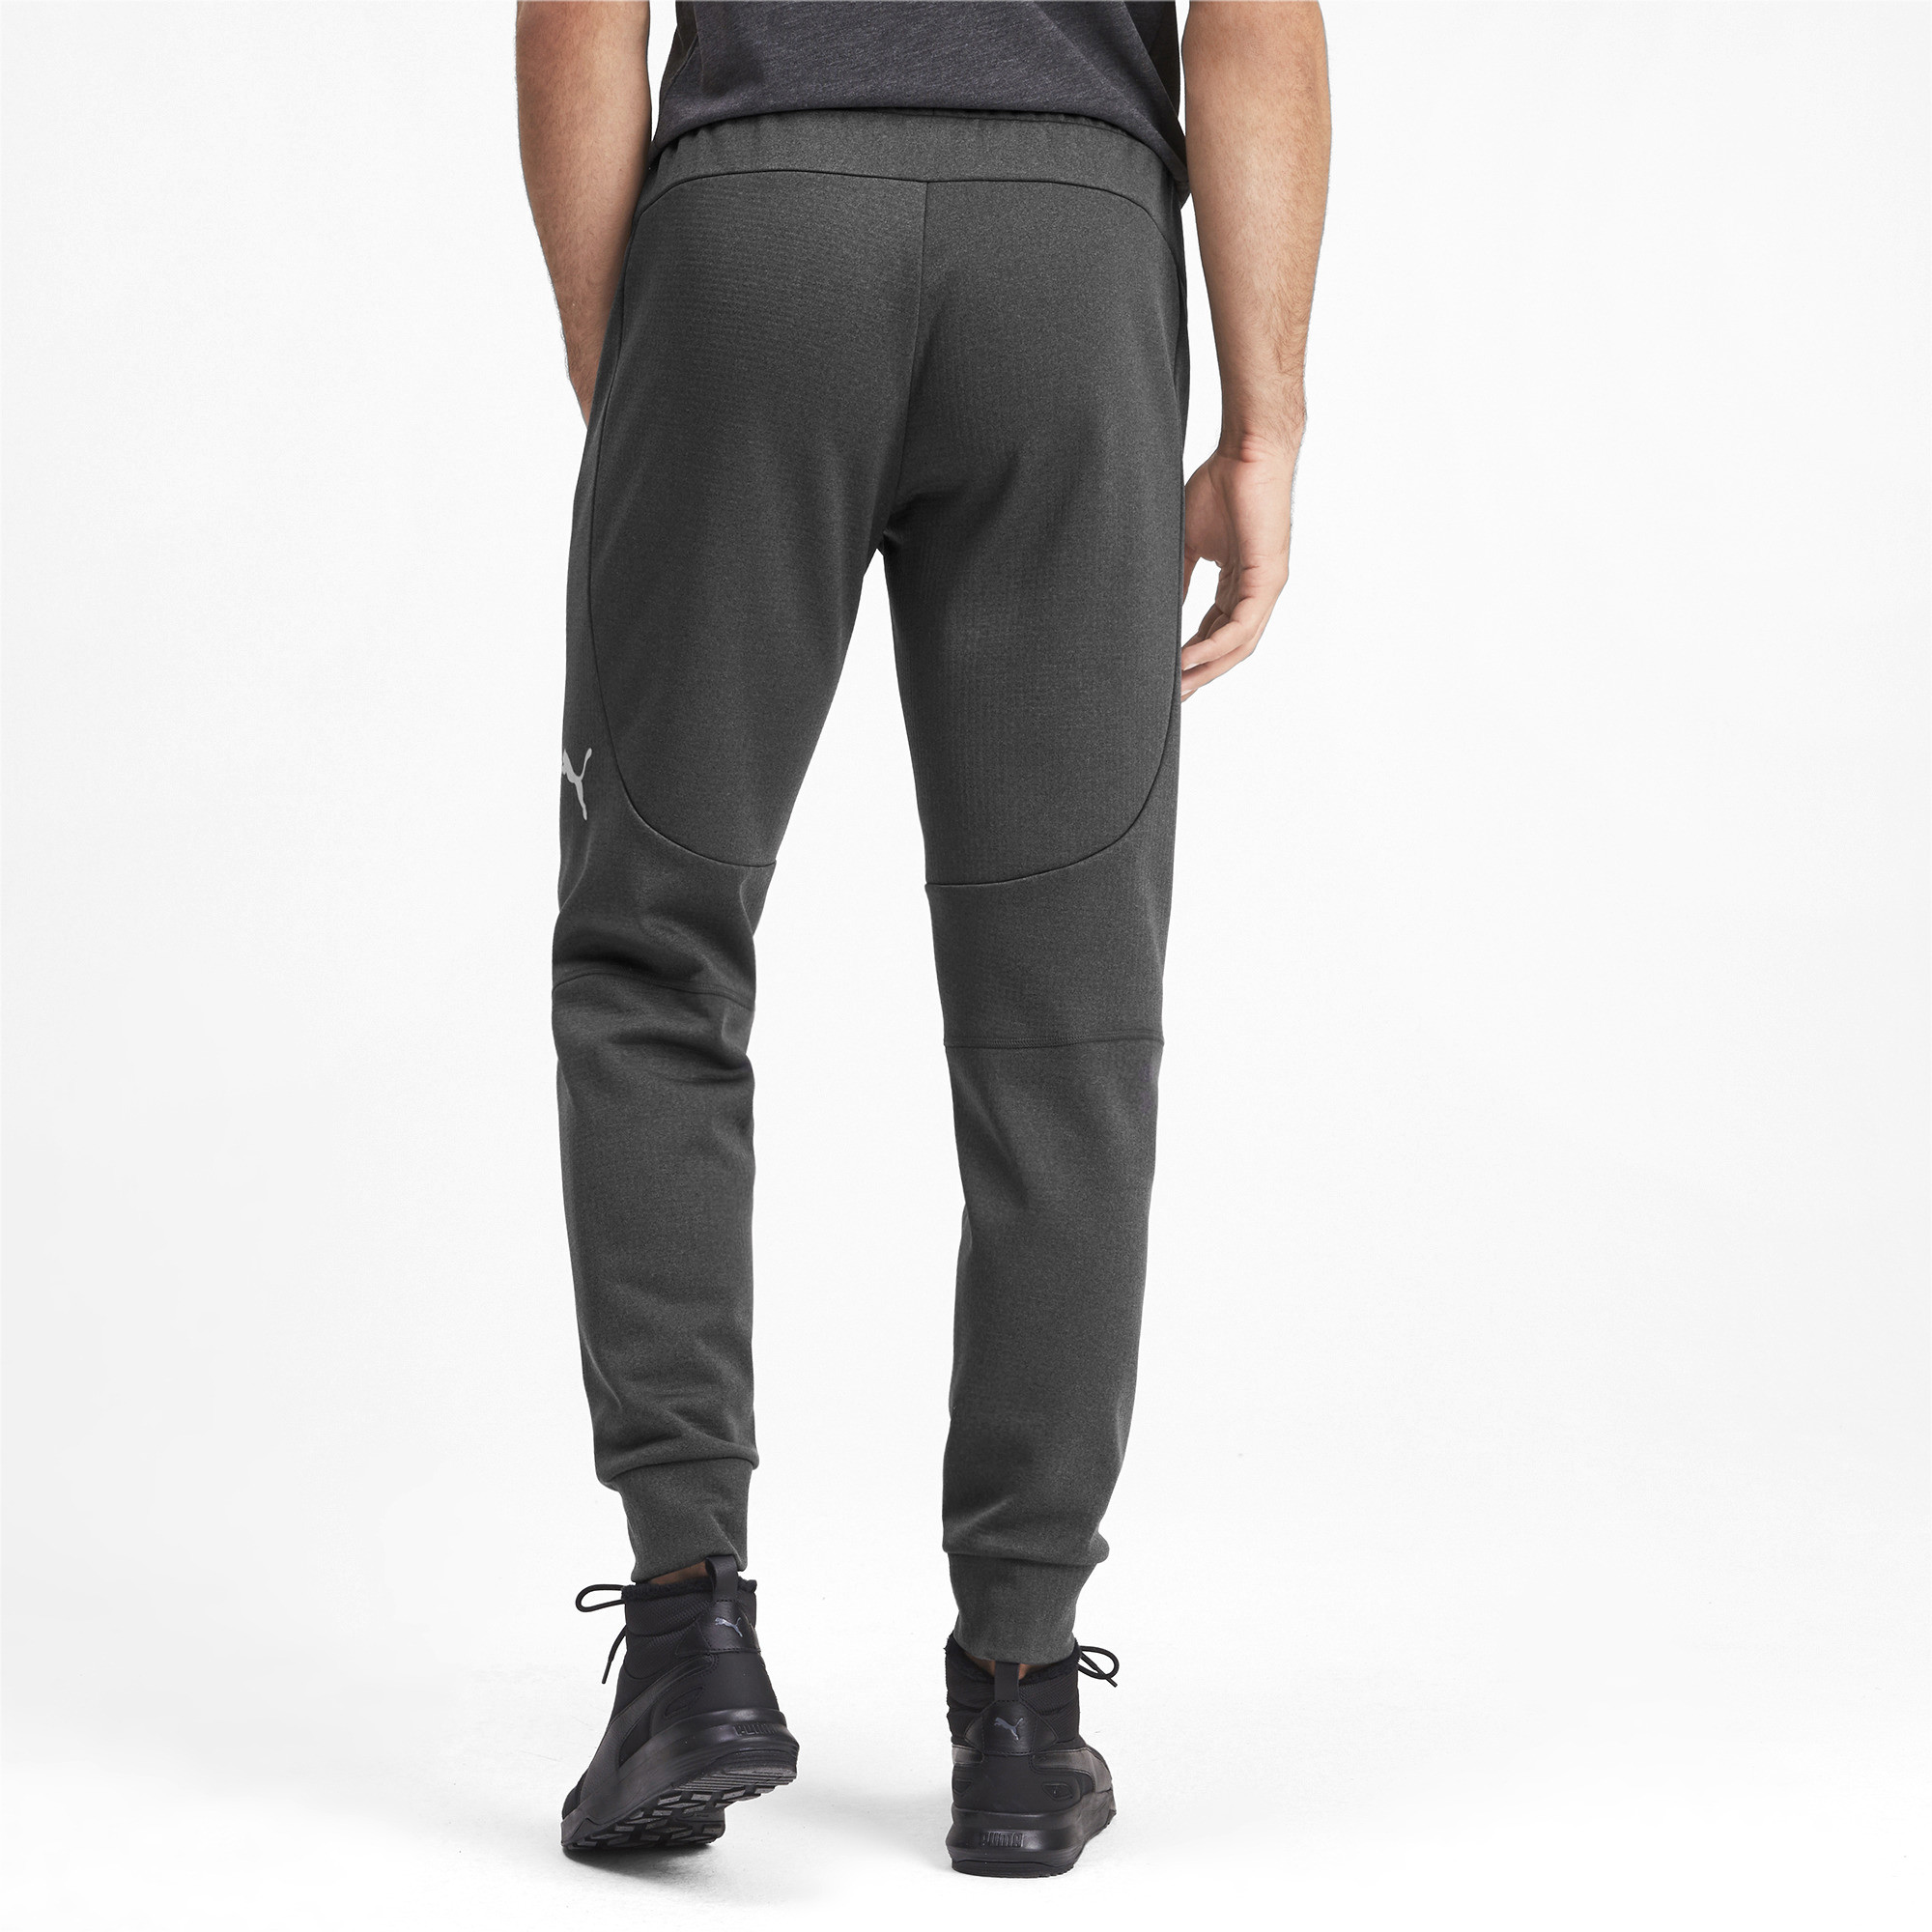 PUMA-Evostripe-Warm-Men-039-s-Pants-Men-Knitted-Pants-Basics miniatura 5